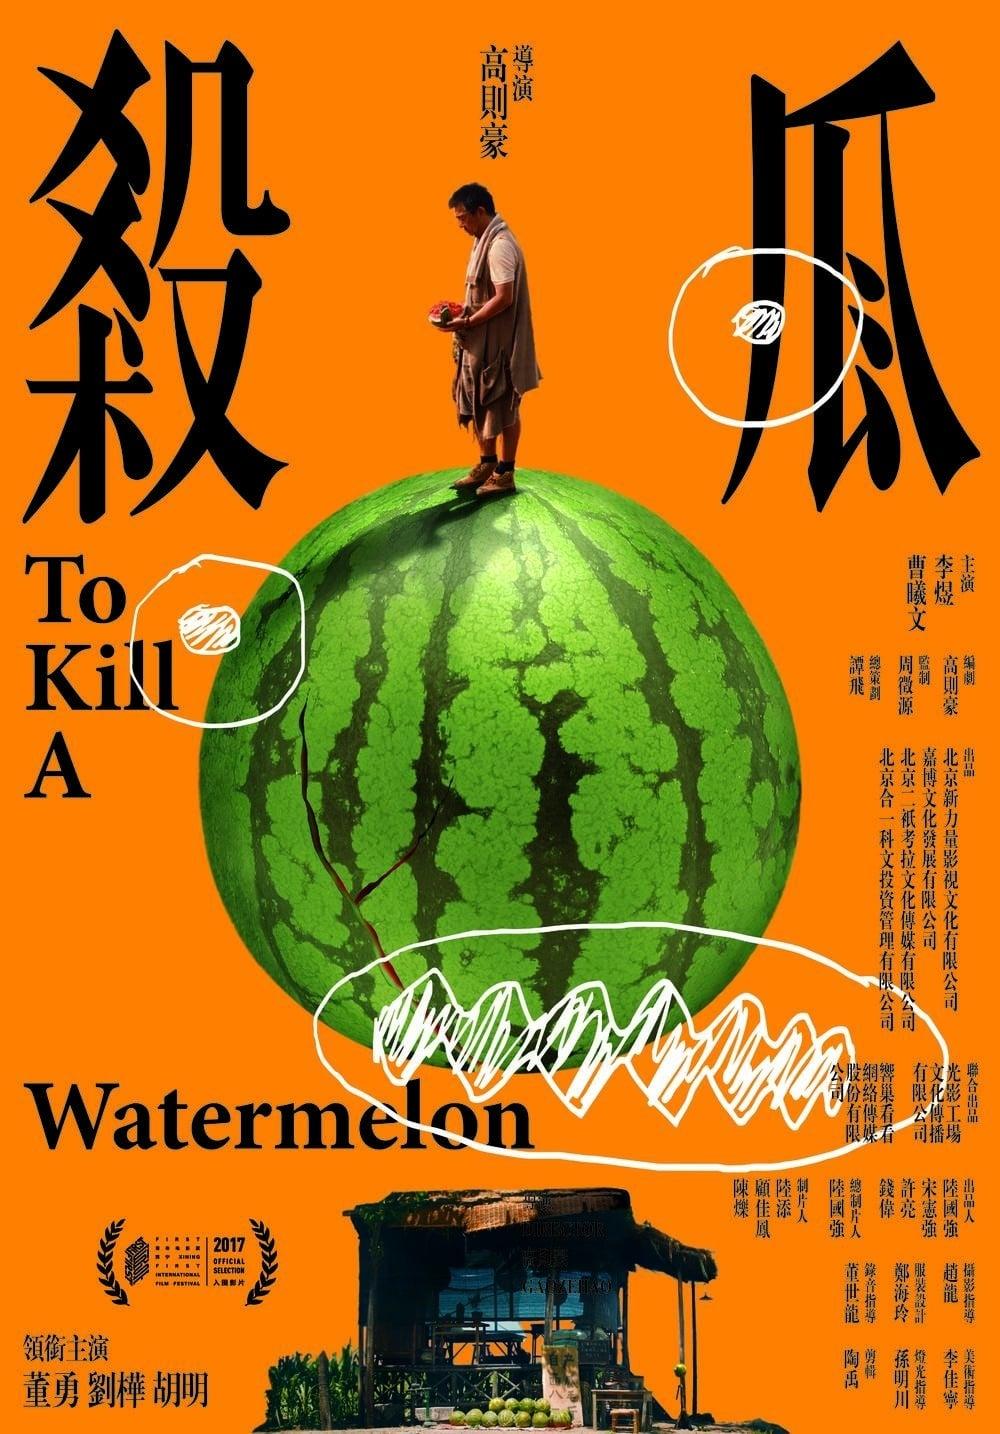 To Kill a Watermelon